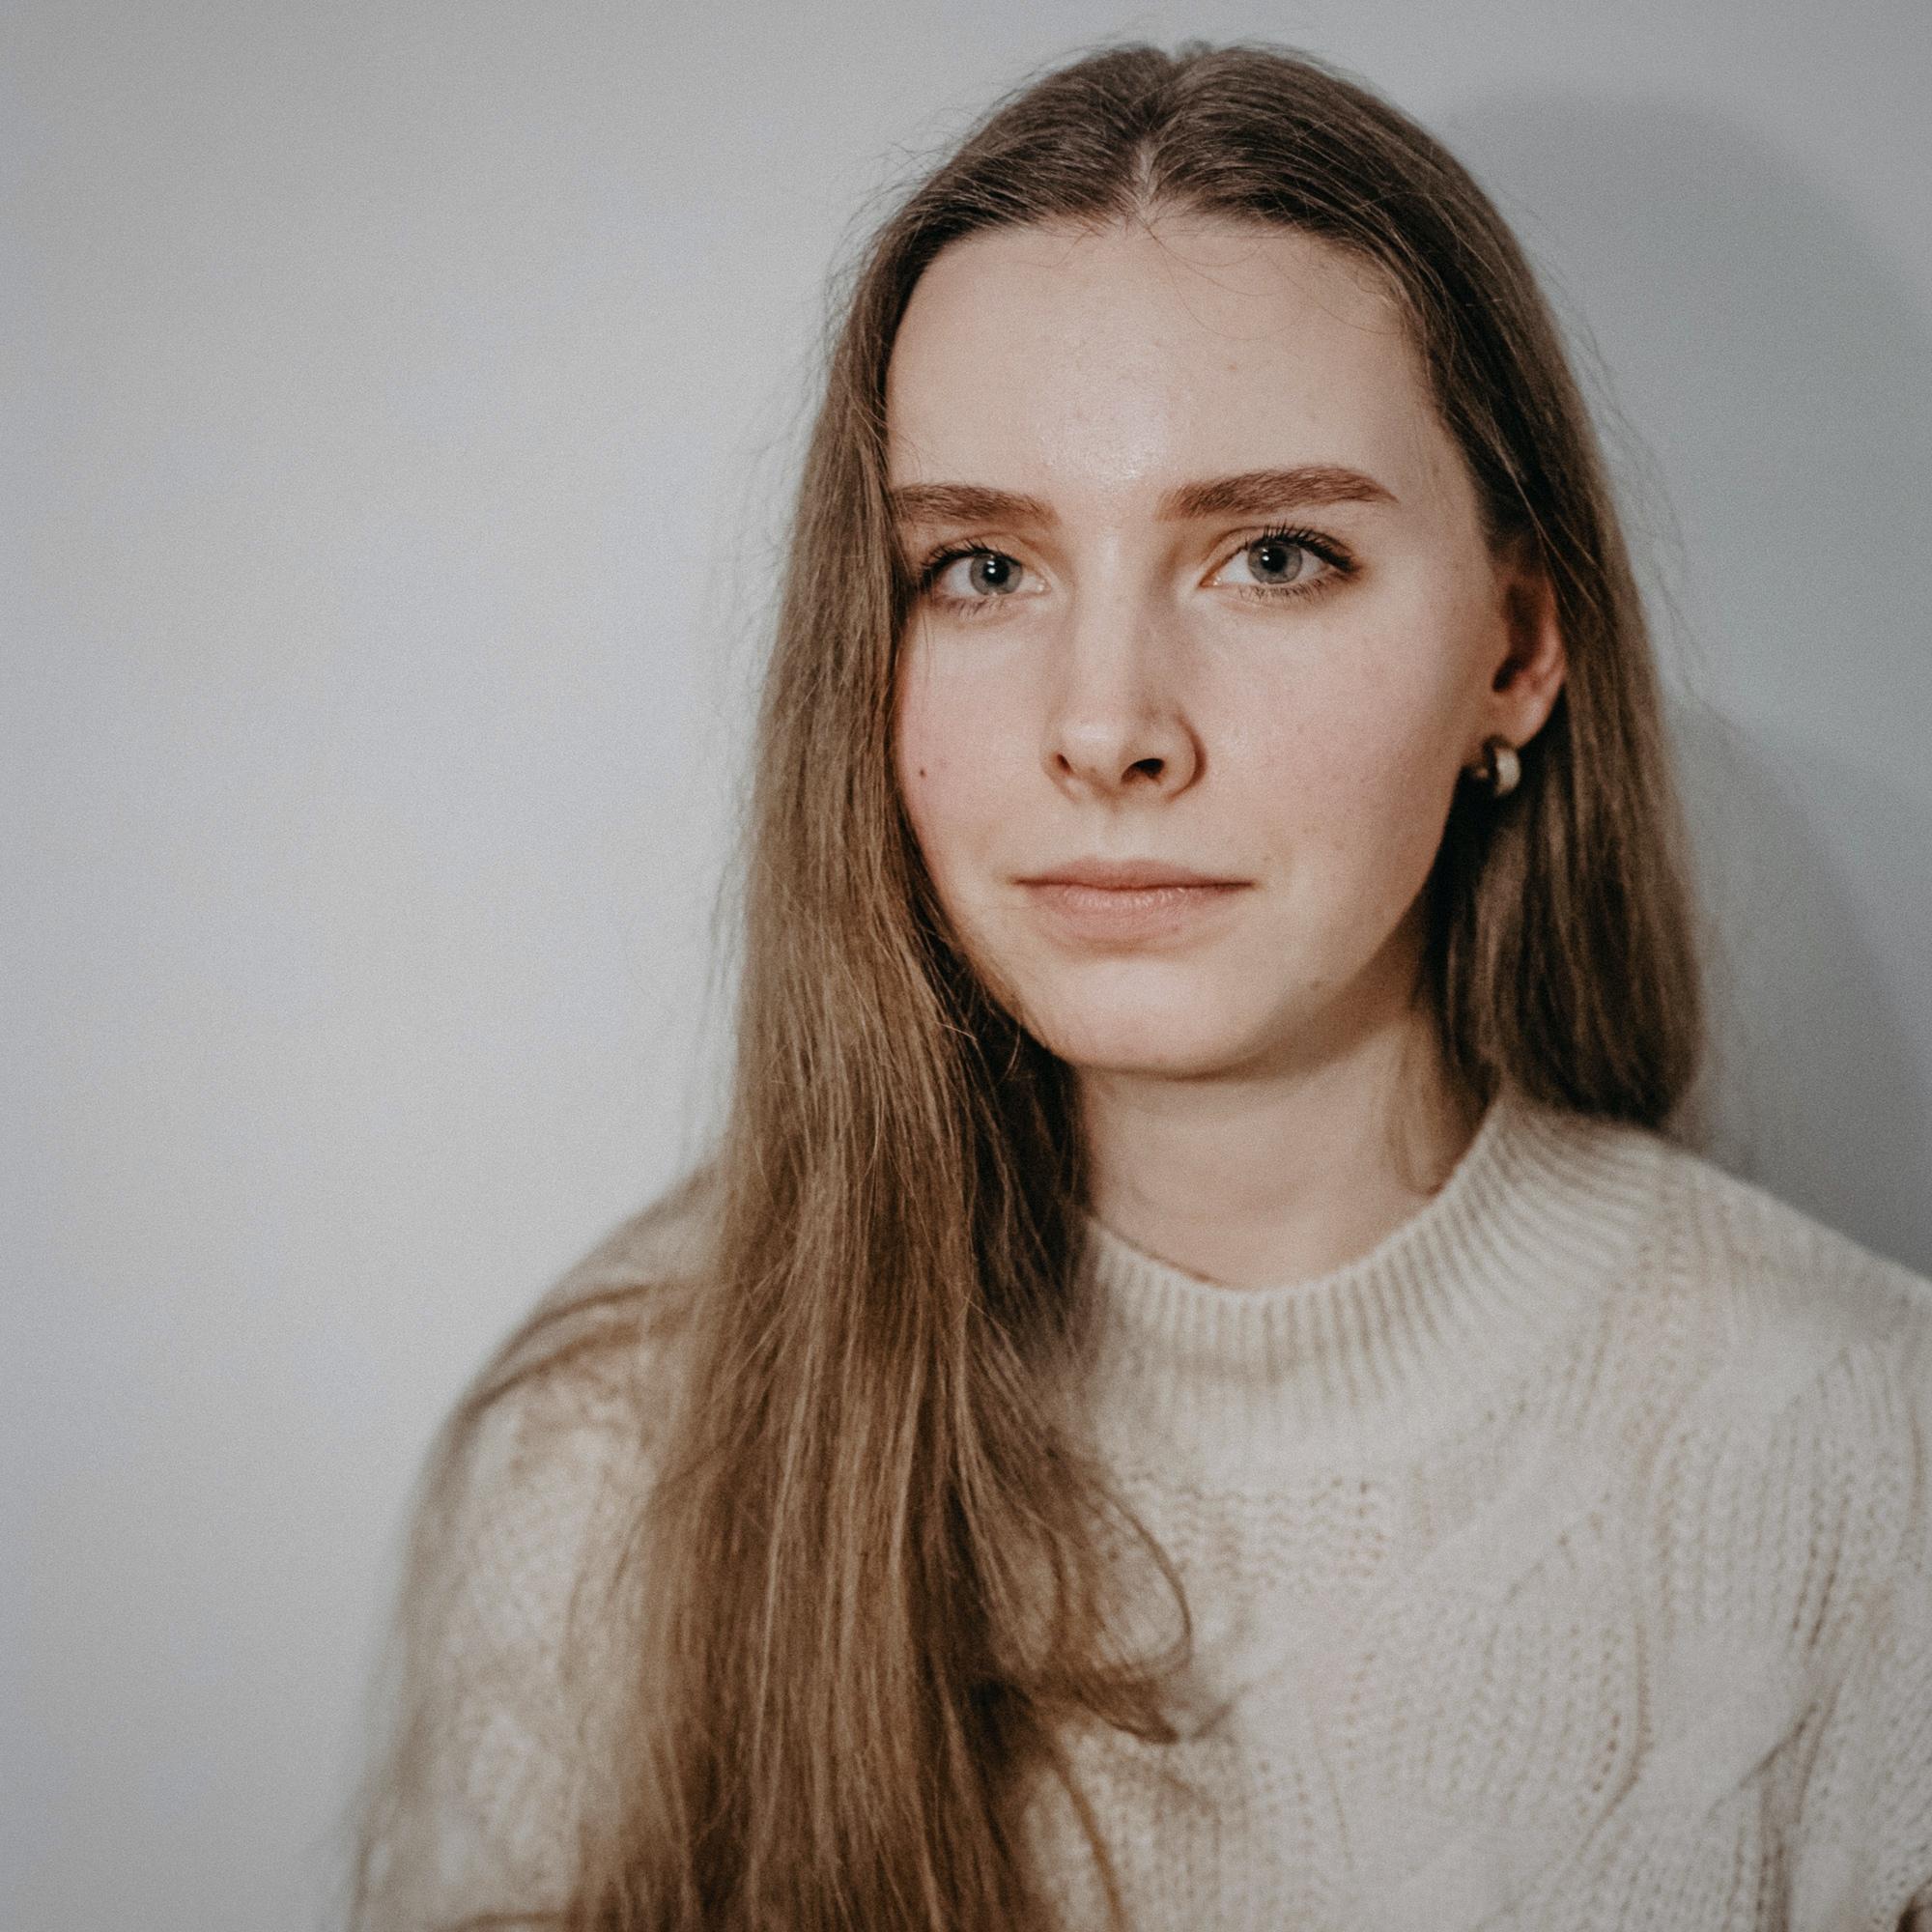 Portrait von Evmenova